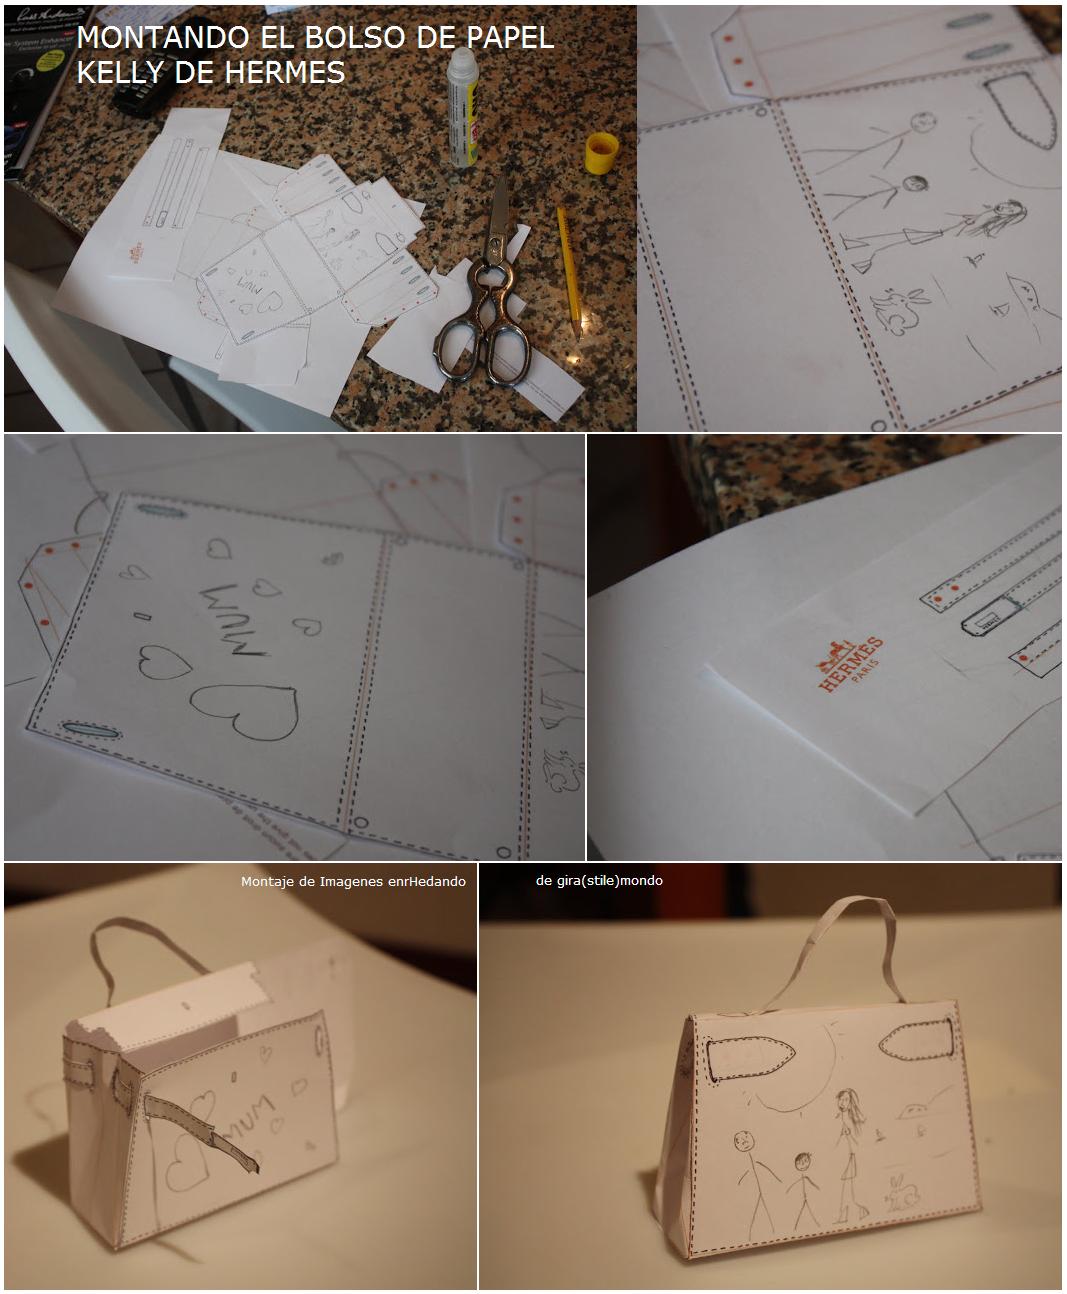 bolsos de Hermés de papel, construir bolsos de papel, plantillas bolsos hermés